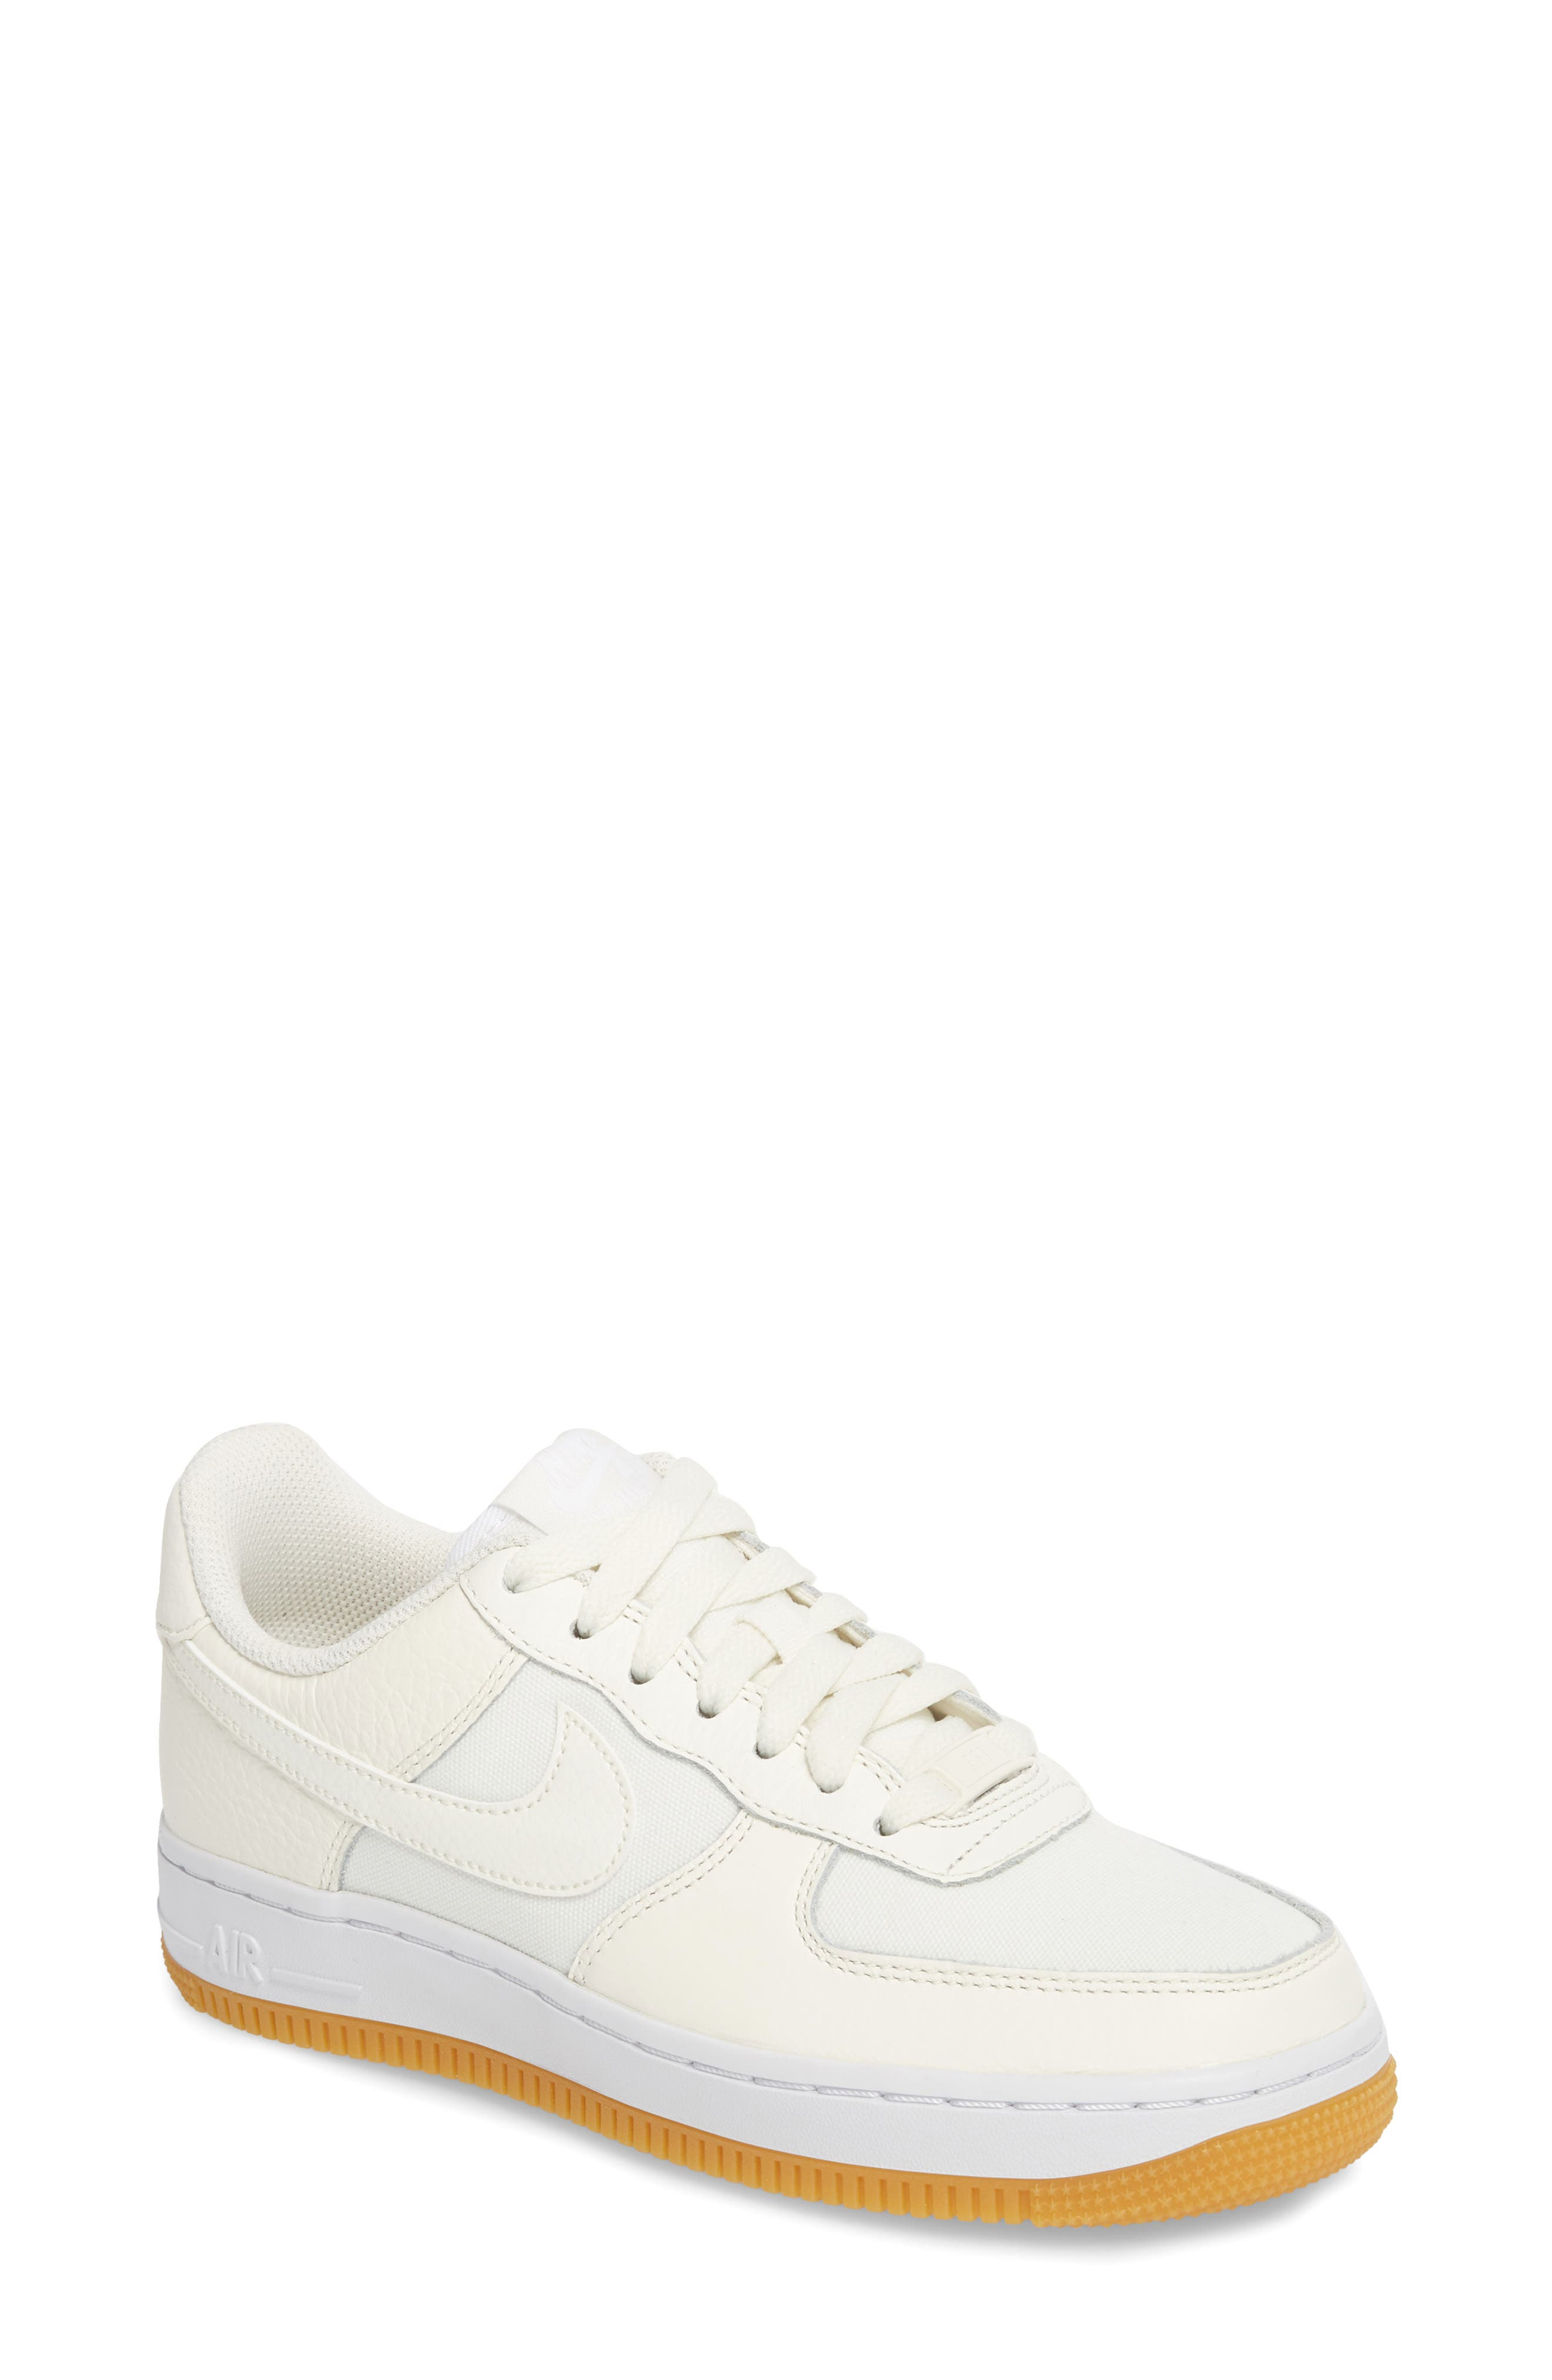 Air Force 1 '07 Premium Sneaker,                             Main thumbnail 1, color,                             Sail/ White/ Light Brown